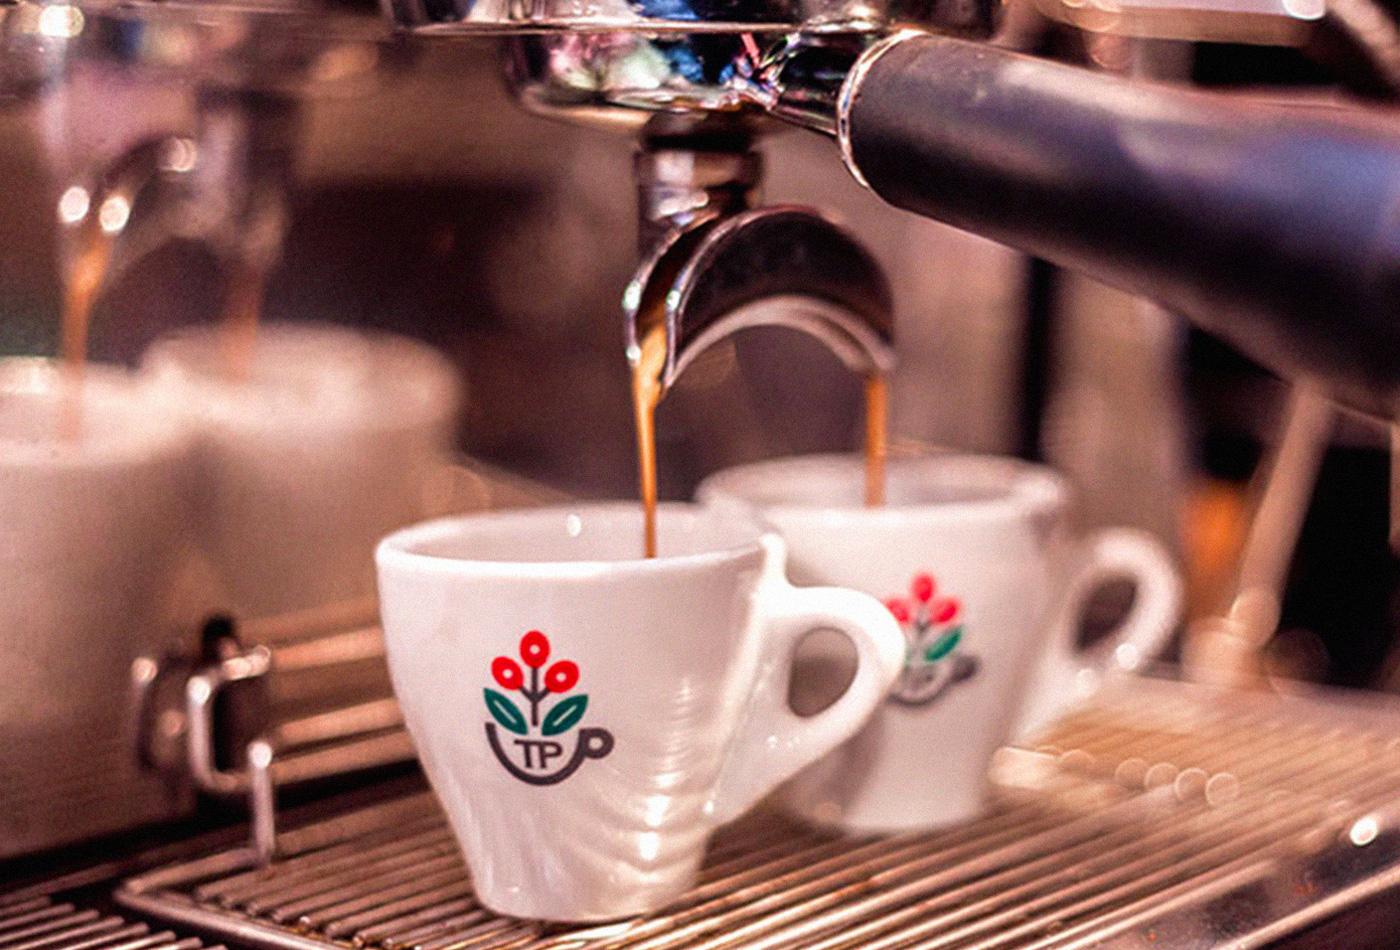 tazzepazze-tazze-pazze-caffetteria-gourmet-genova-coffee-specialty-brewing-andrea-cremone-barista-baristas-branding-vacaliebres-logo-espresso